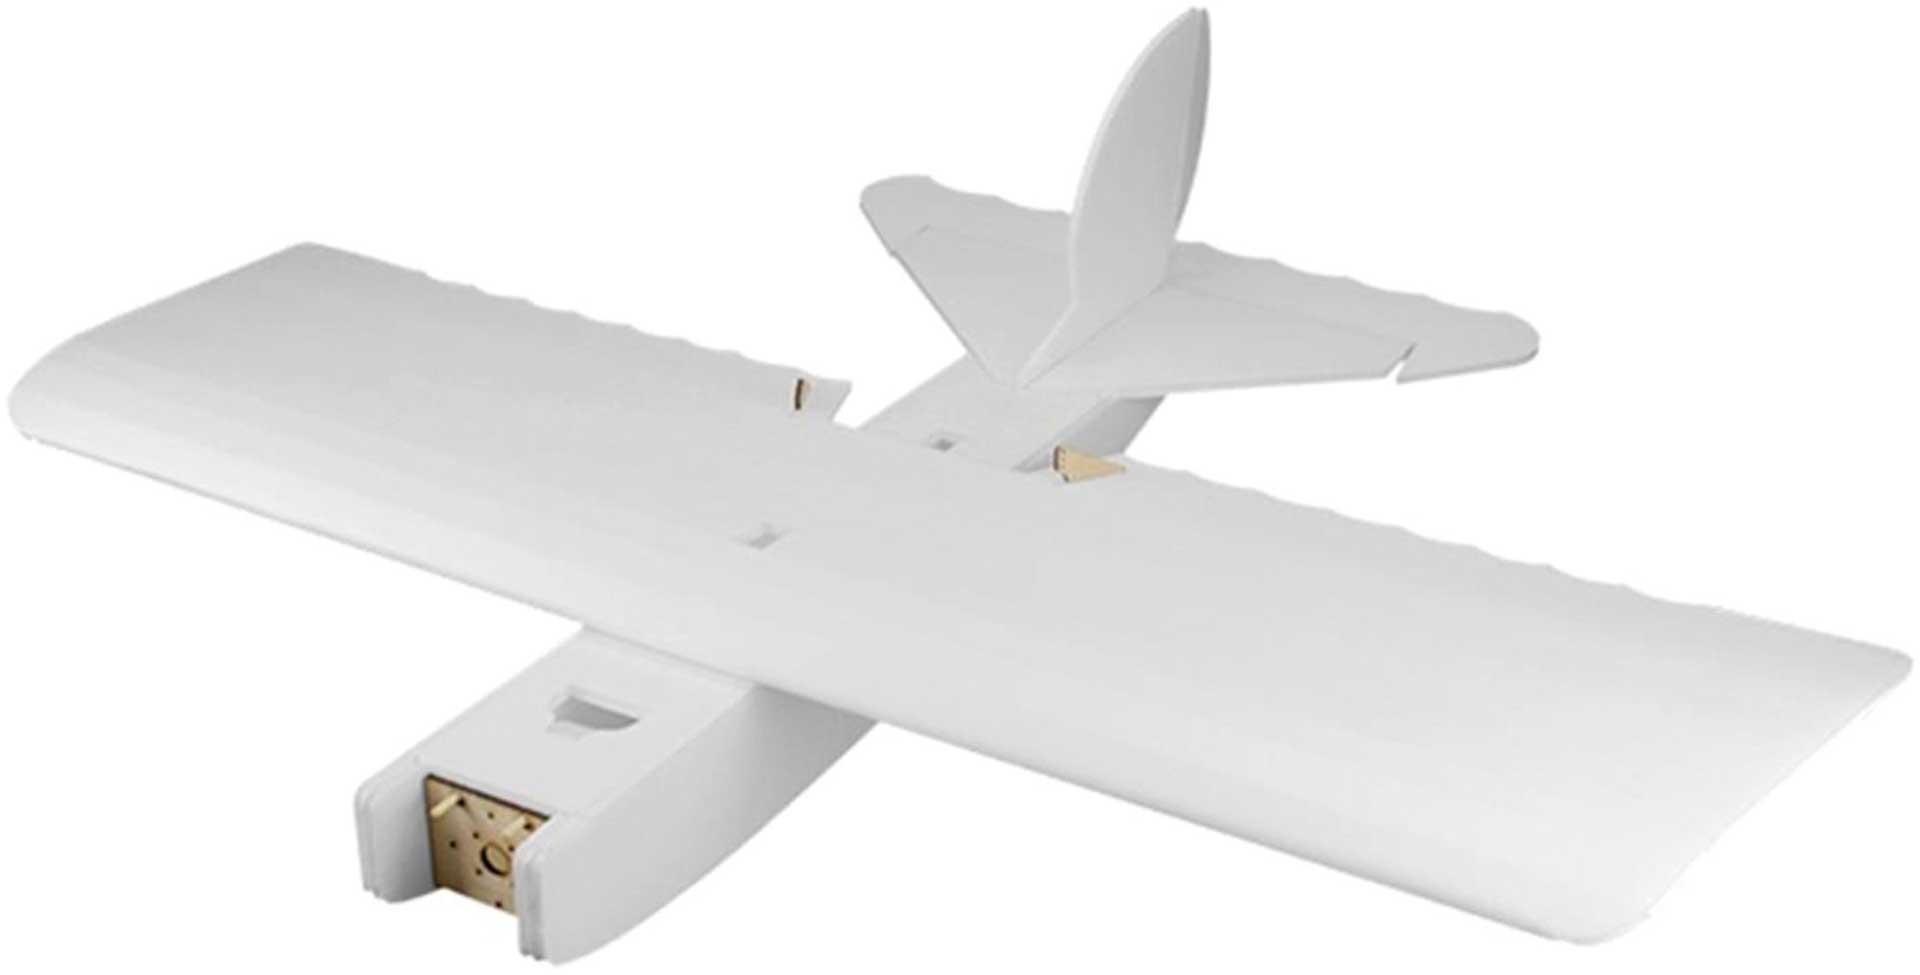 FLITE TEST Bloody Baron Speed Build Kit Maker Foam 737mm